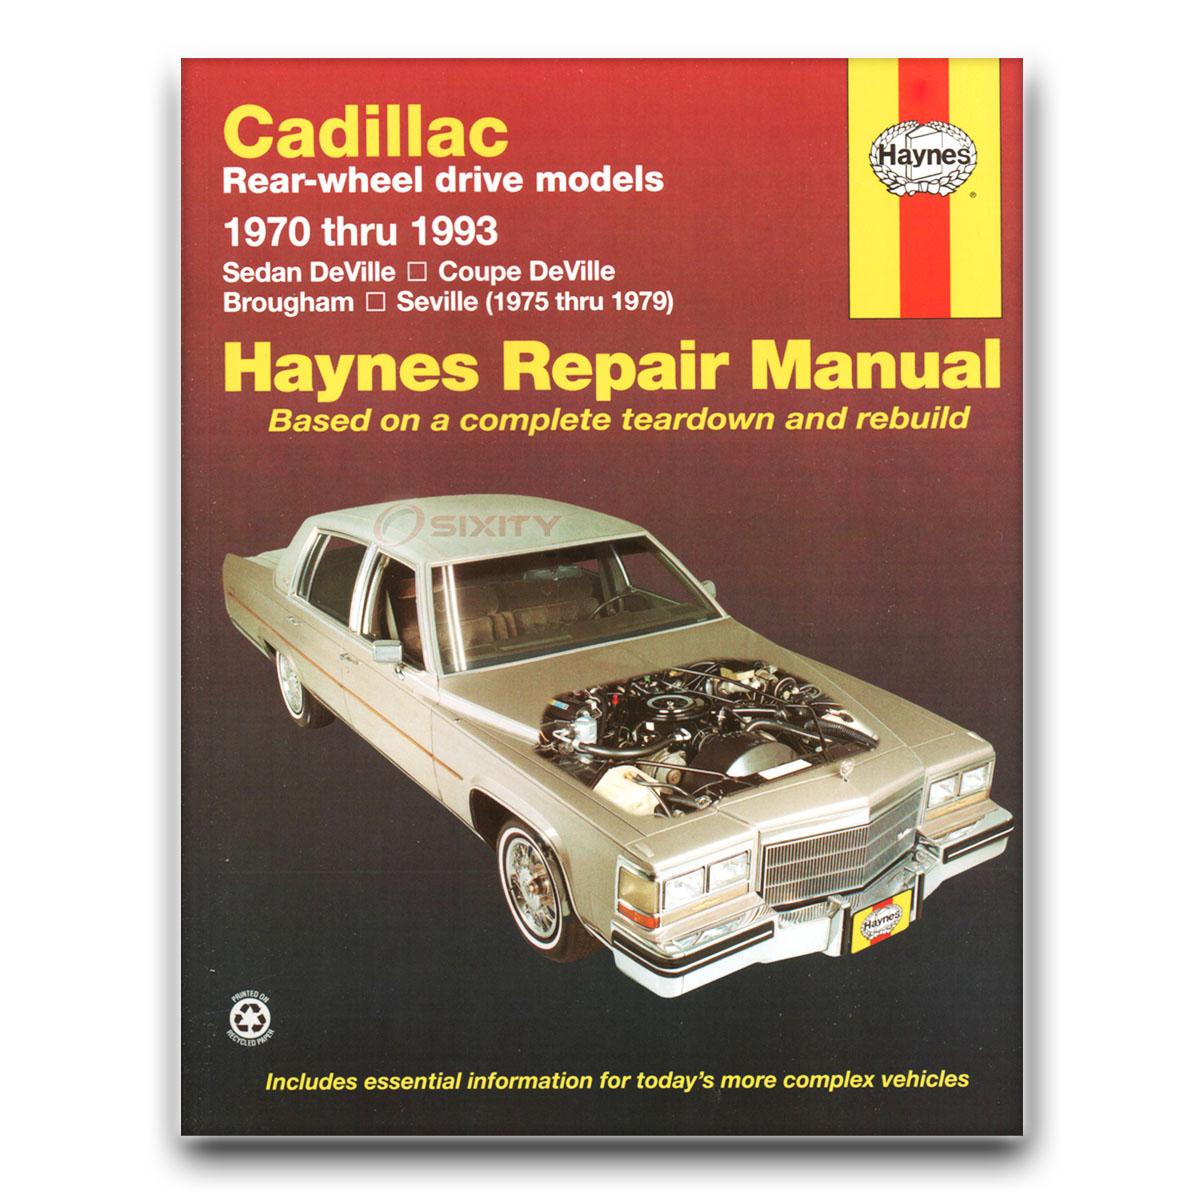 Haynes Repair Manual for Cadillac DeVille Cabriolet Phaeton d'Elegance Base  mi